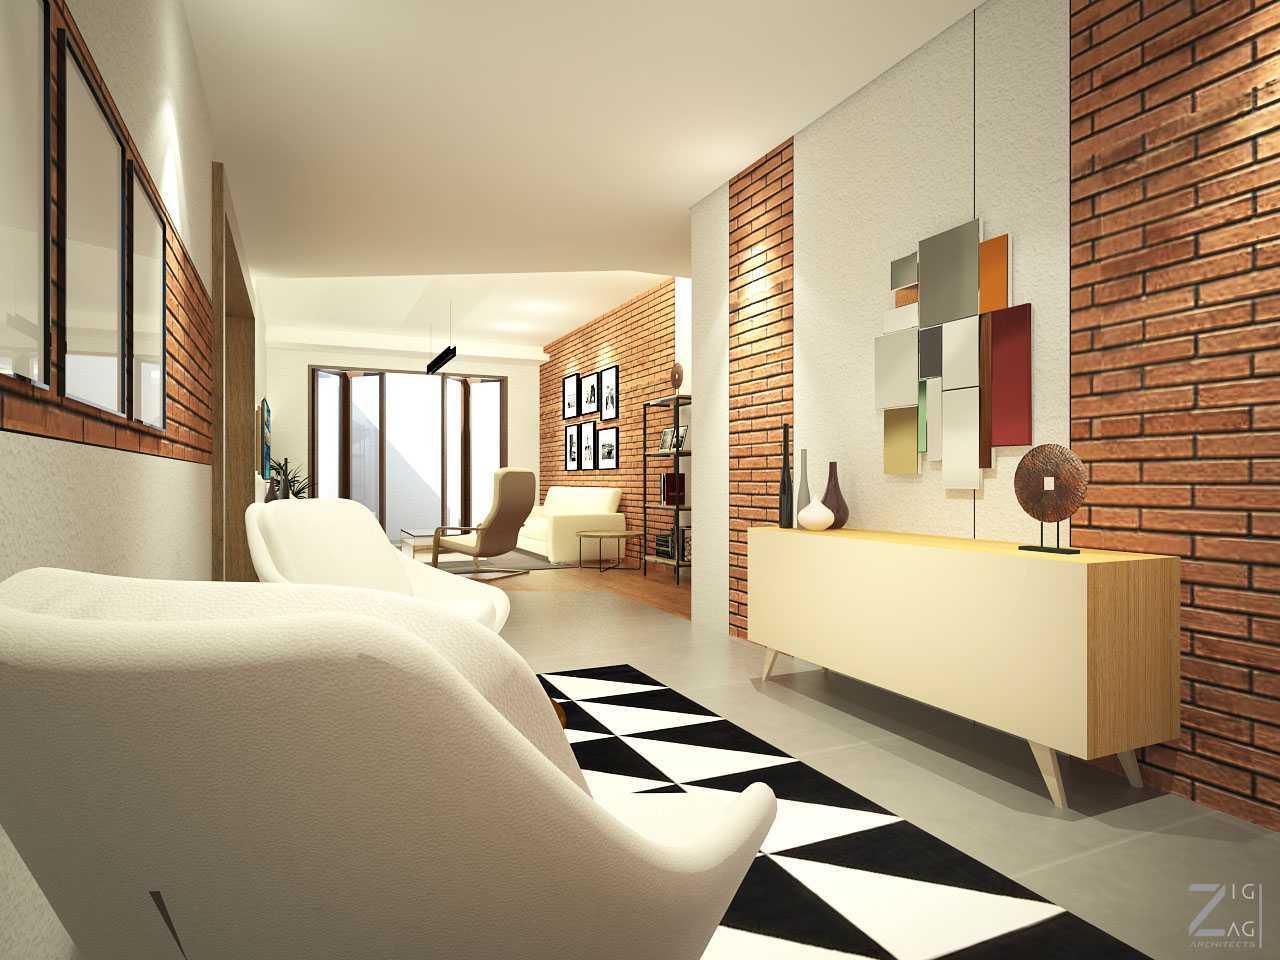 Zigzag Architecture Studio Pulomas House Daerah Khusus Ibukota Jakarta, Indonesia  Guestarea-View01  37604